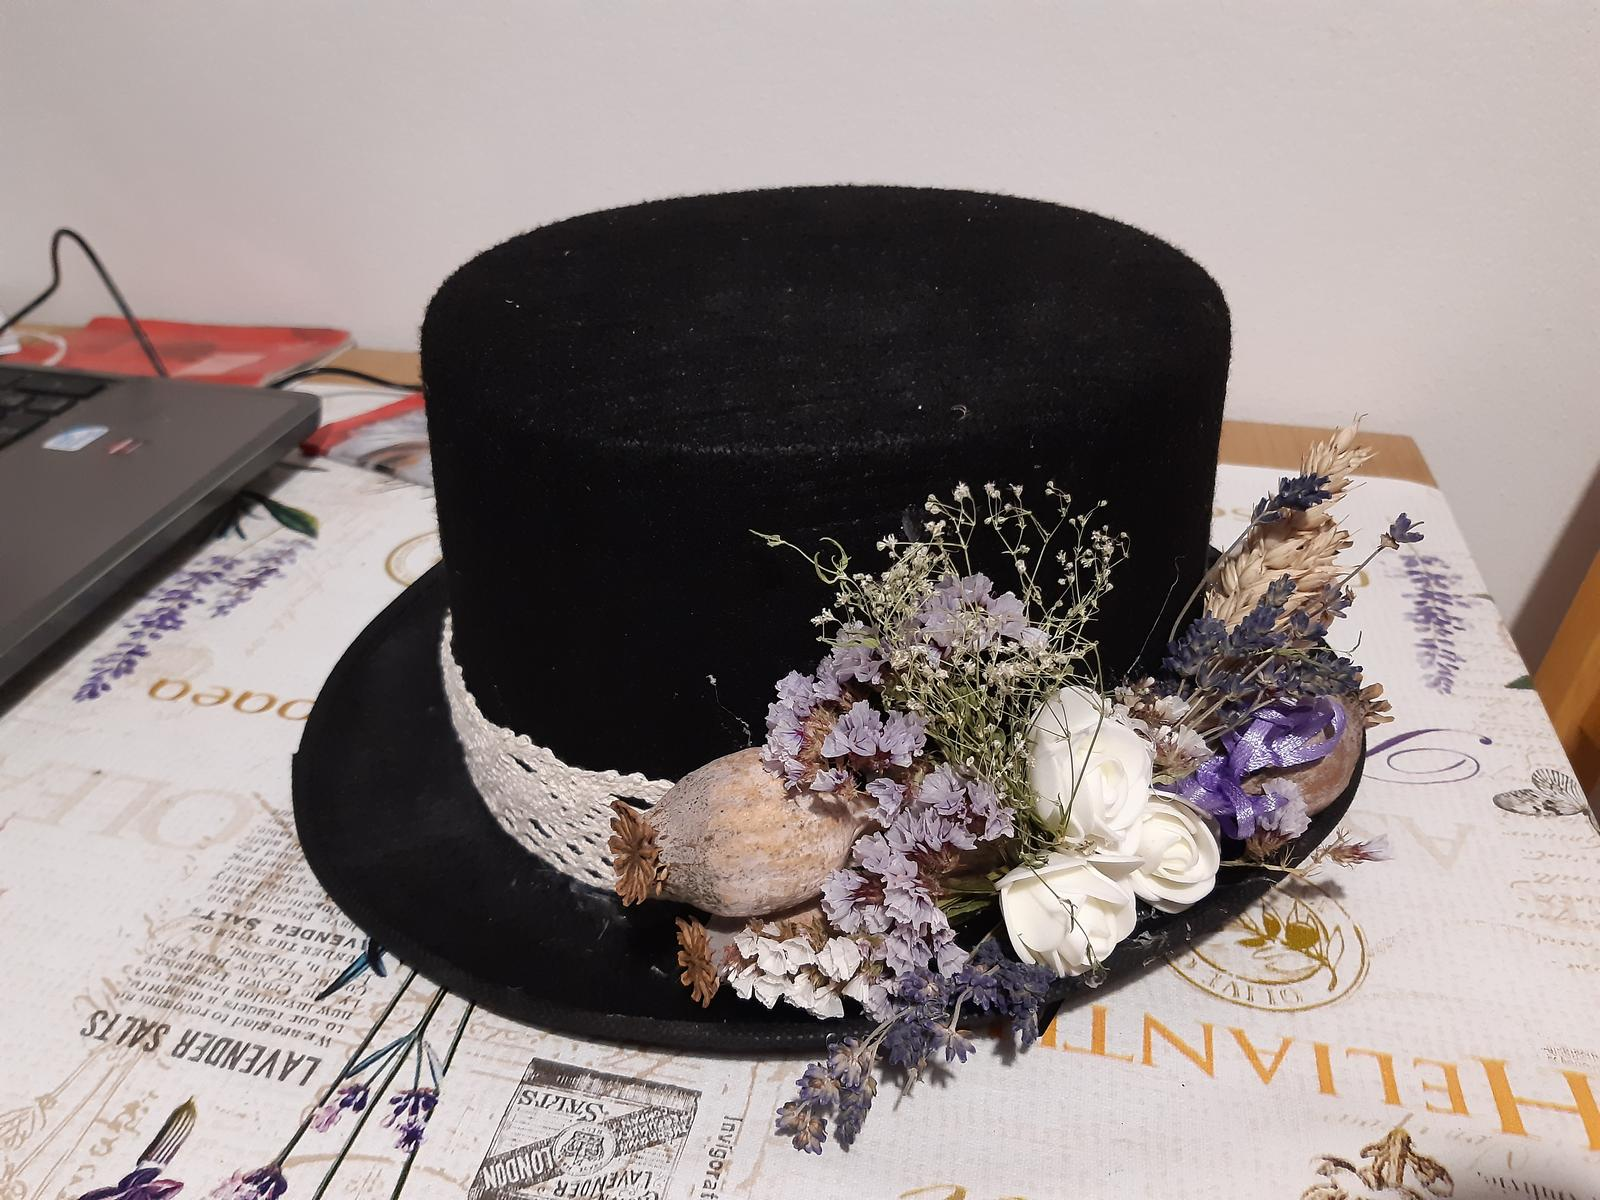 klobouk na auto - Obrázek č. 1